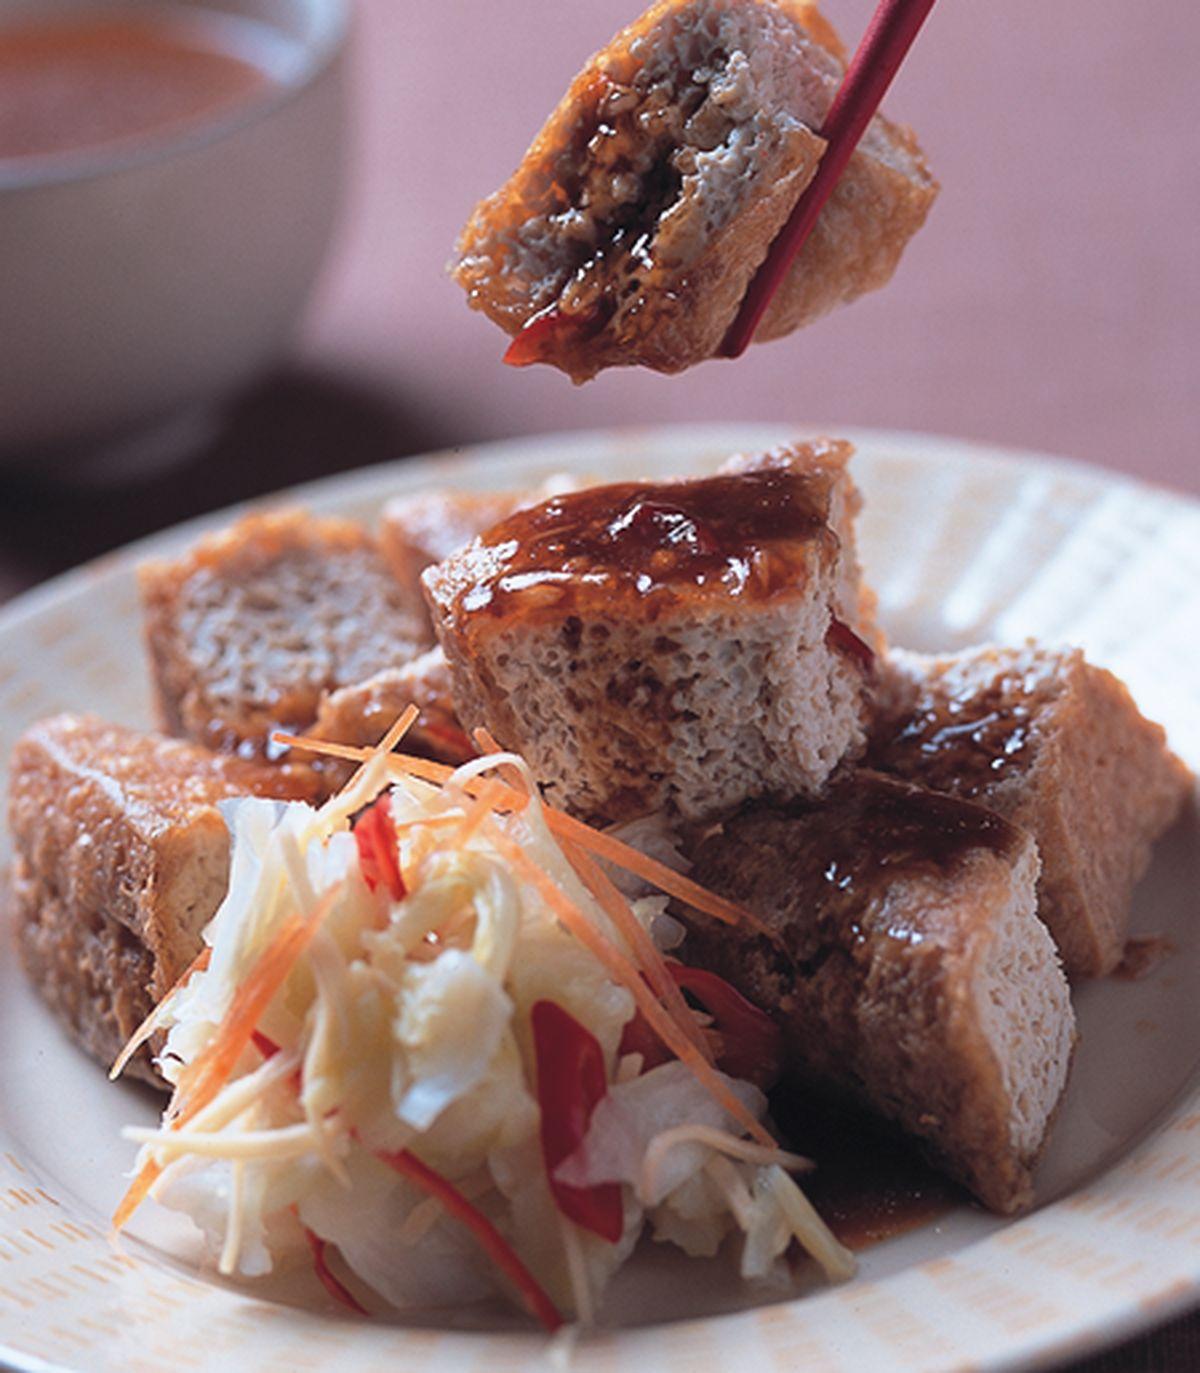 【食譜】炸臭豆腐(1):www.ytower.com.tw